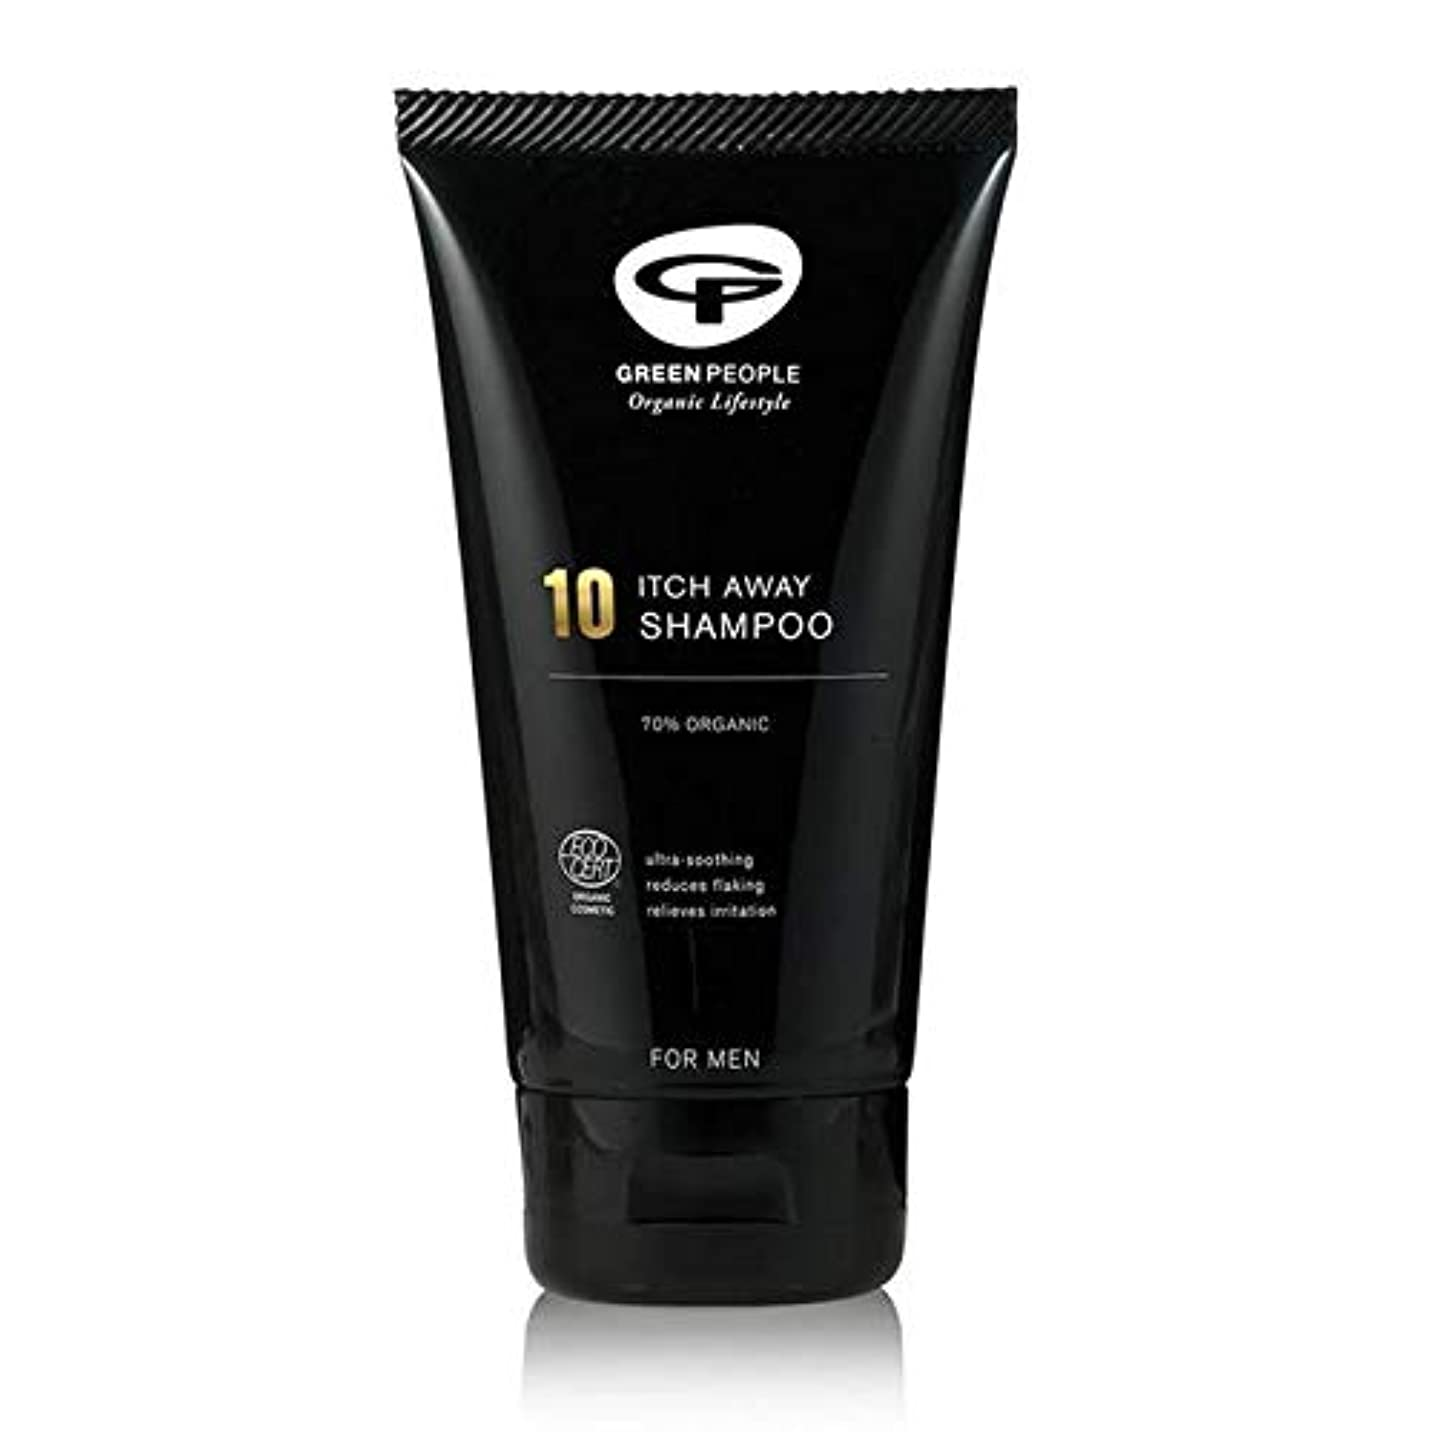 [Green People ] 男性のための緑の人々は、シャンプー150ミリリットルを離れかゆみ - Green People for Men Itch Away Shampoo 150ml [並行輸入品]